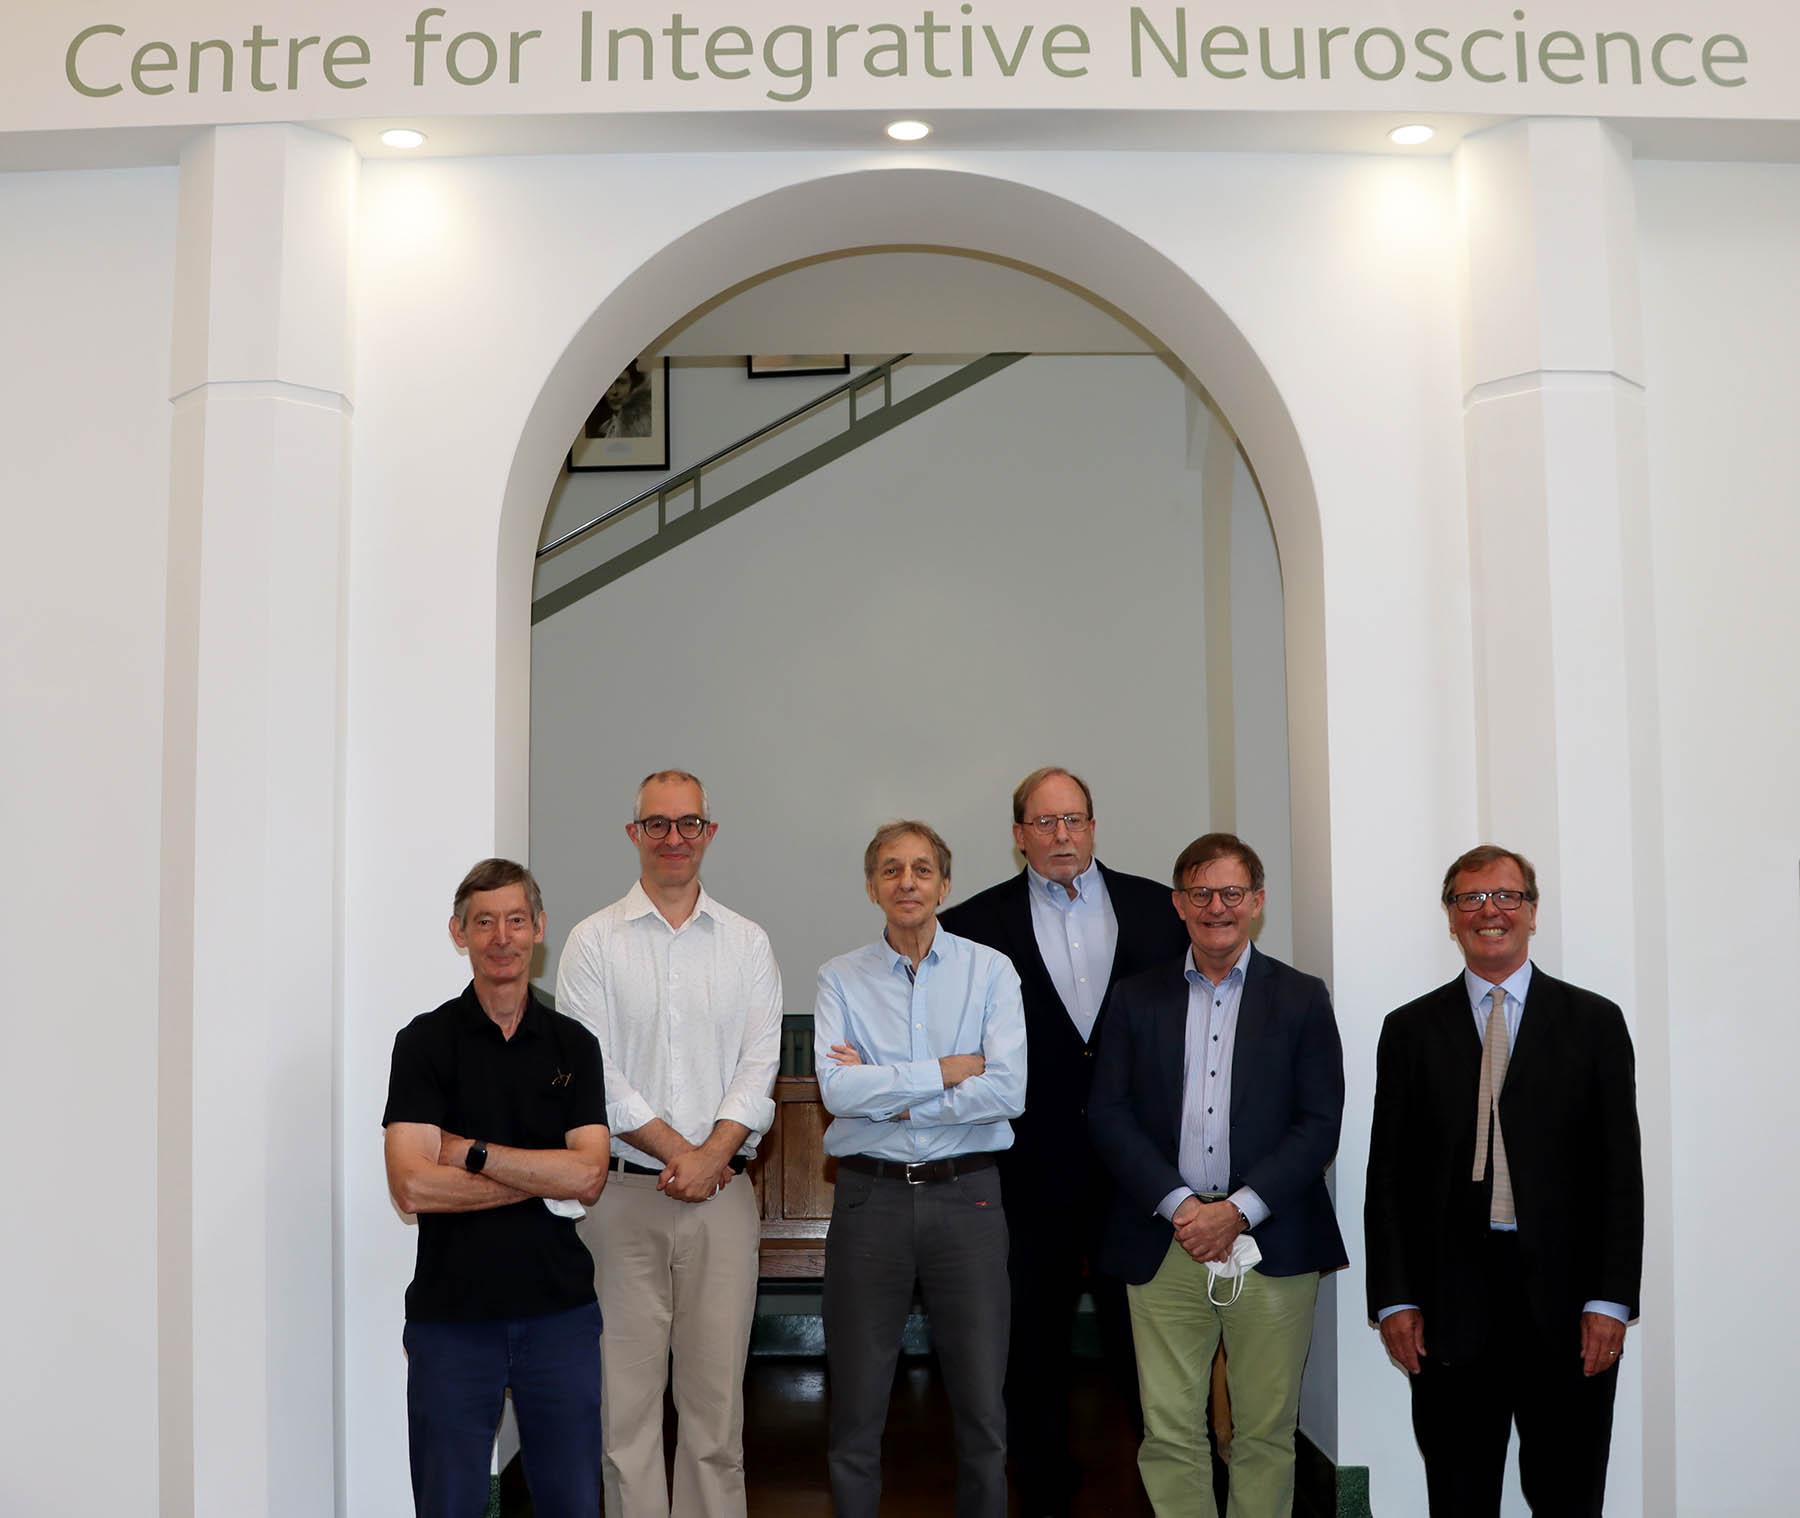 Blakemore Festschrift - visual cortex group